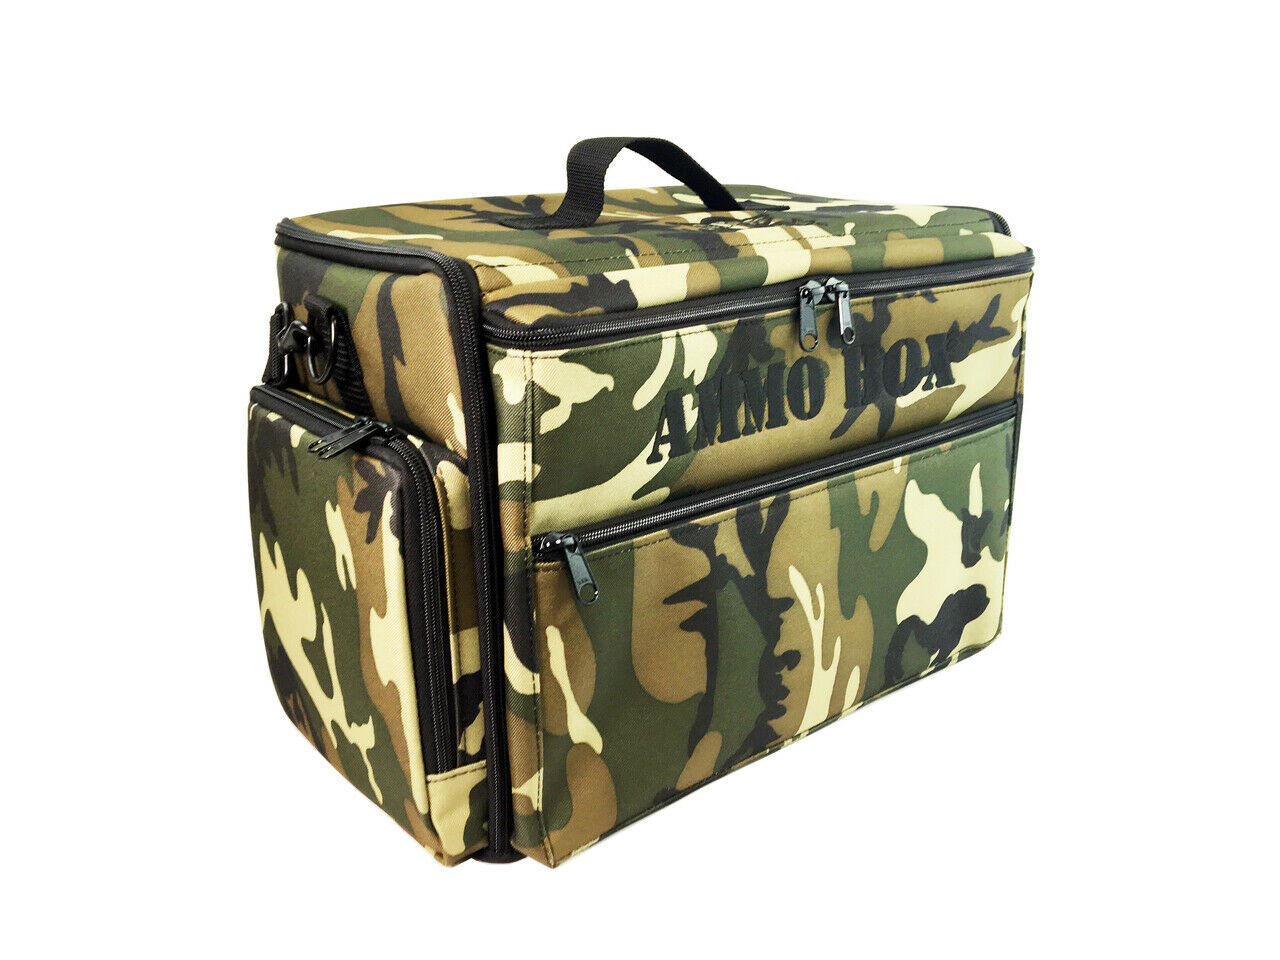 Battle Foam Wargames Bag BNIB Ammo Box Bag Standard Load Out - Camo